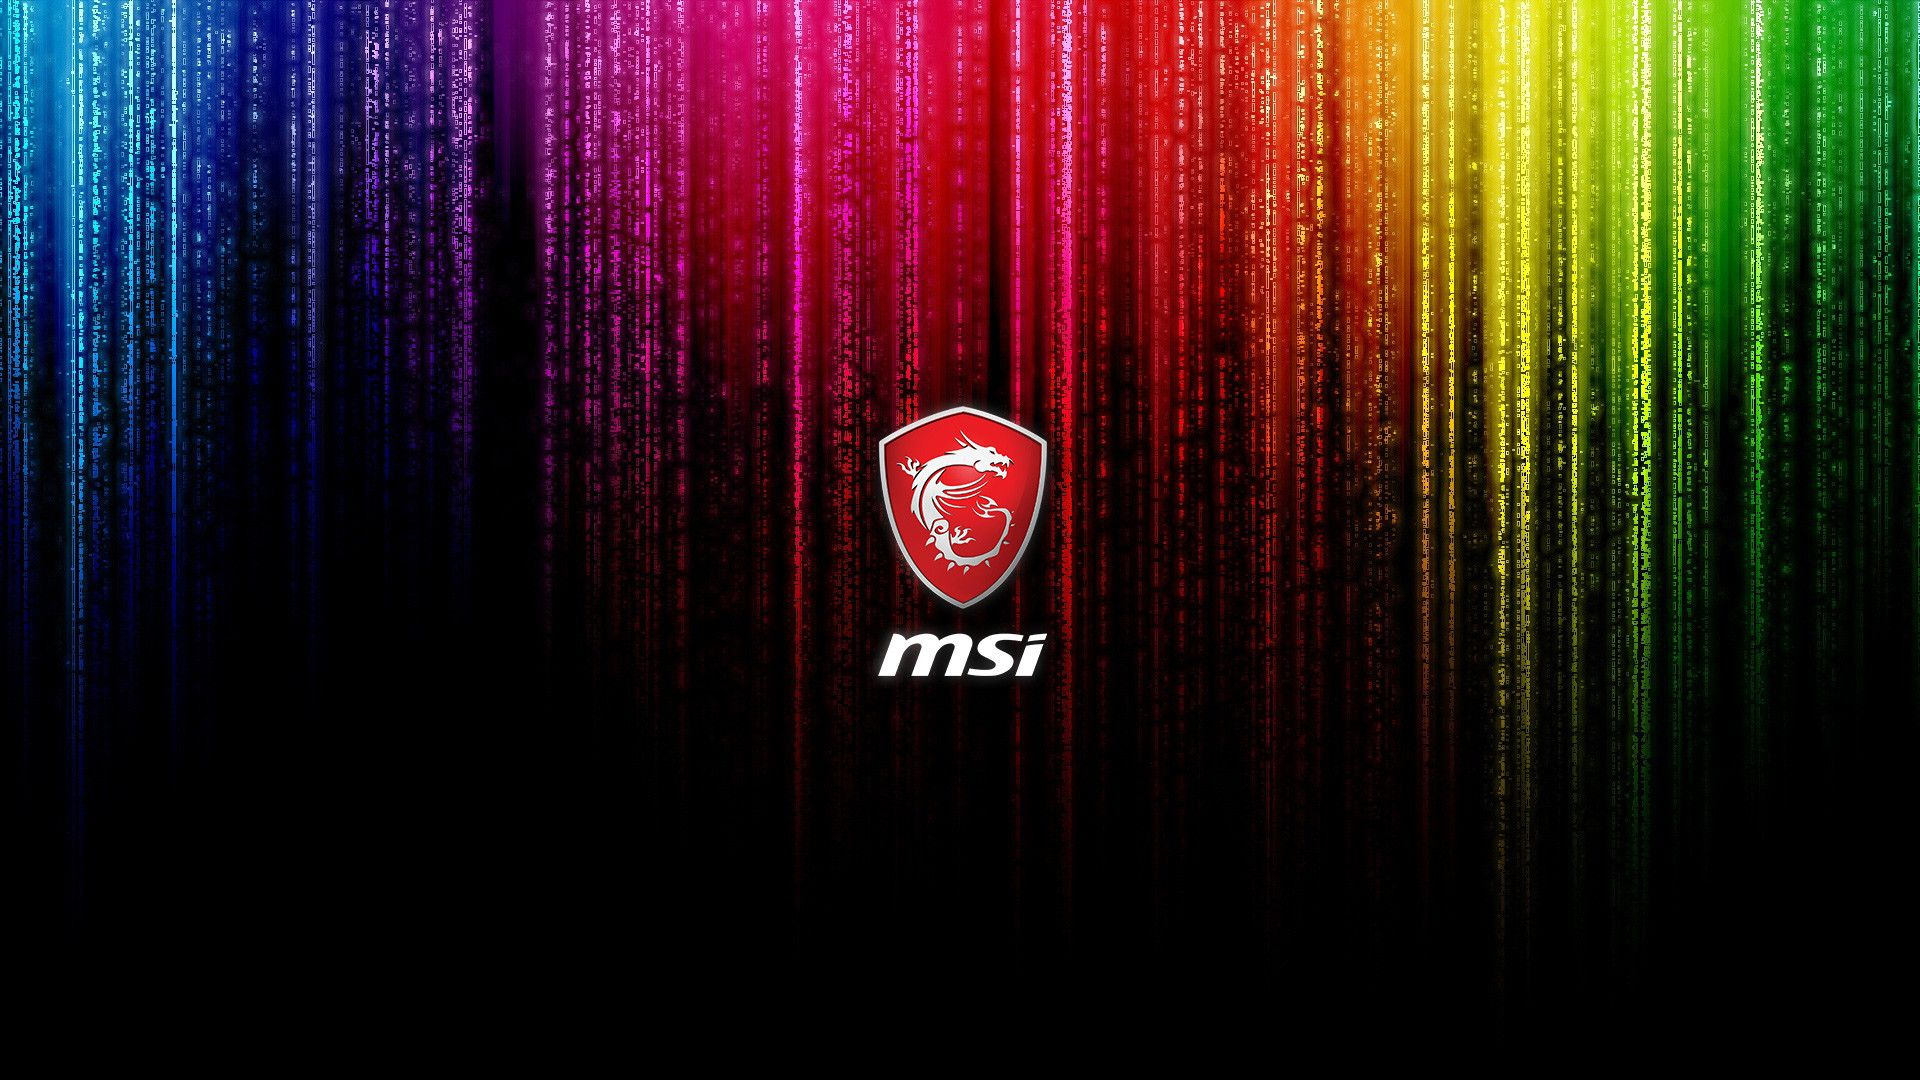 Msi 4k Wallpapers Top Free Msi 4k Backgrounds Wallpaperaccess